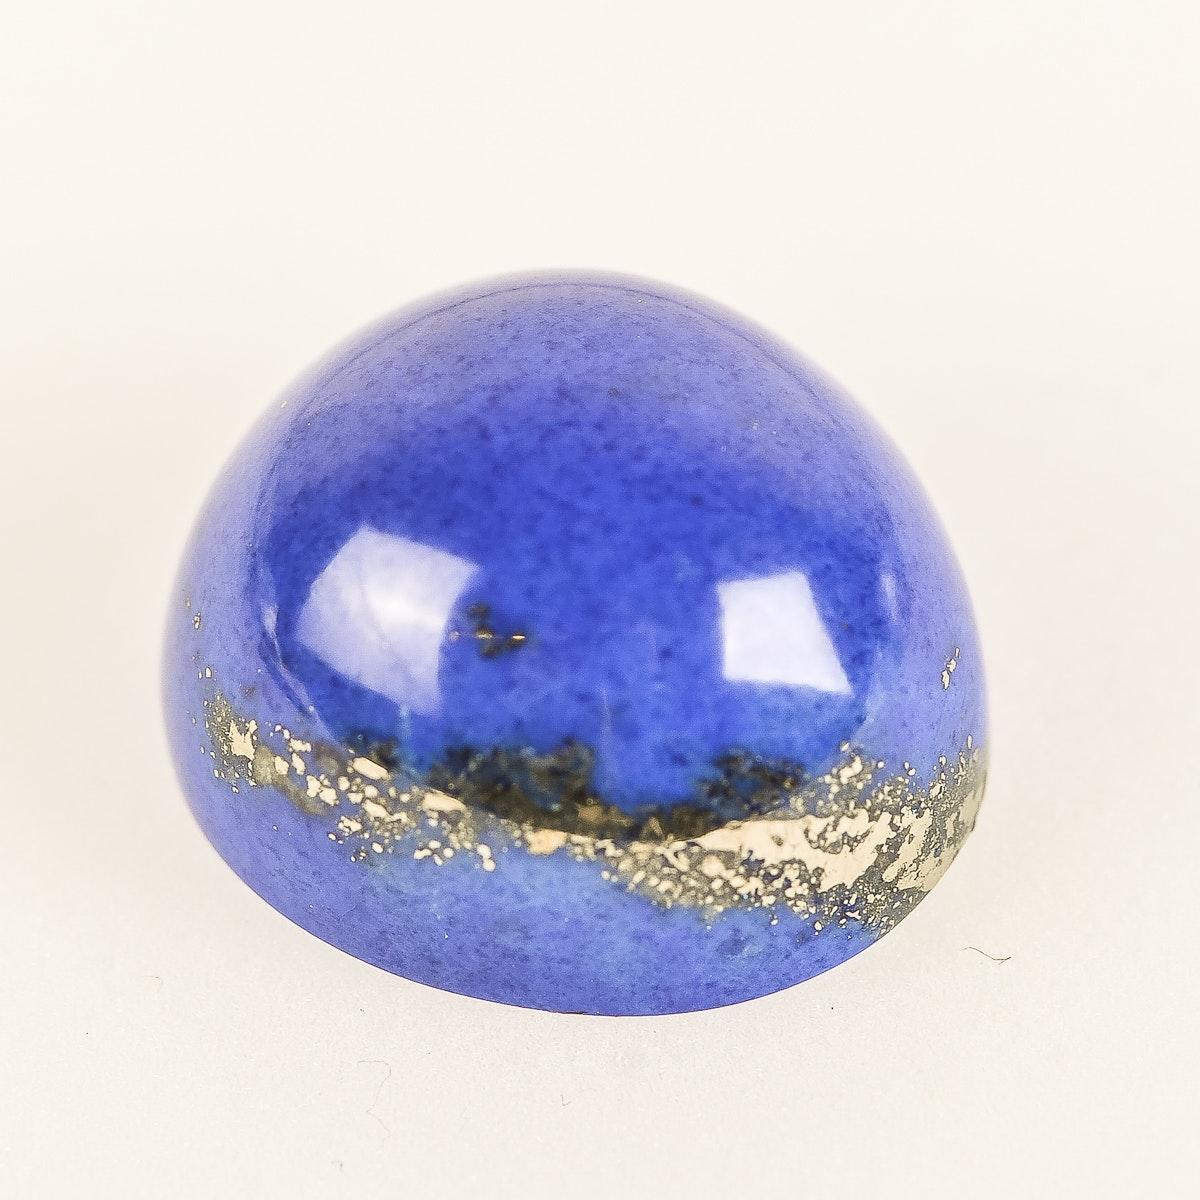 Loose 38.8 CTW Dyed Lapis Lazuli Stone